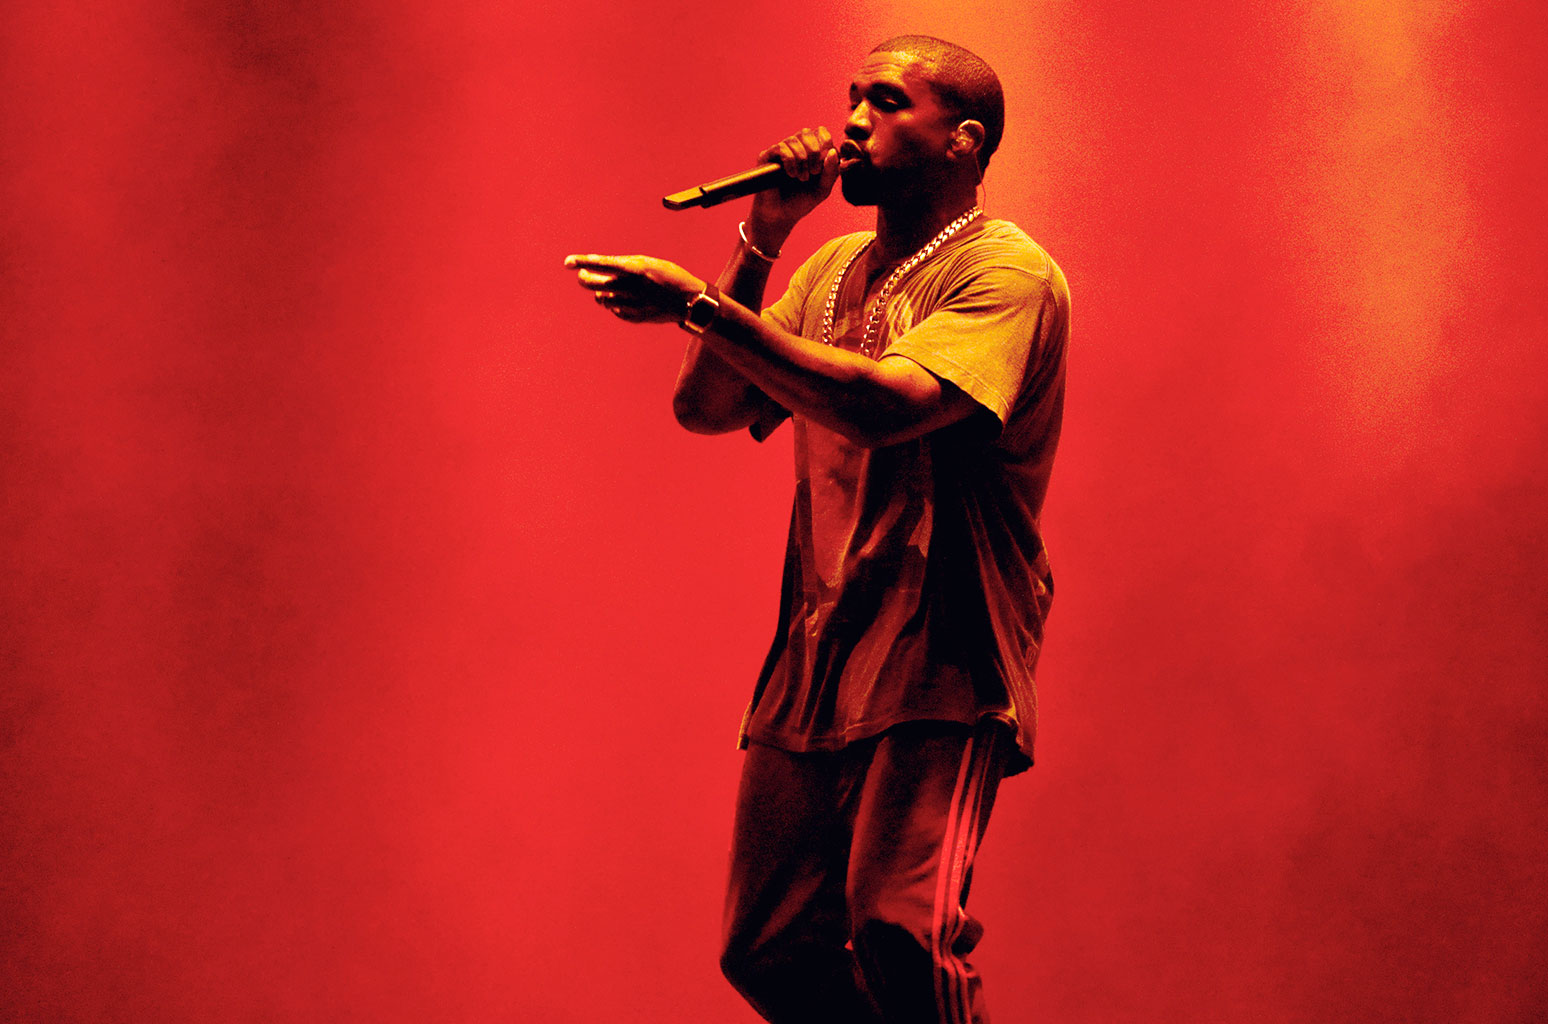 Kanye-West-The-Meadows-Sept-2016-billboard-1548